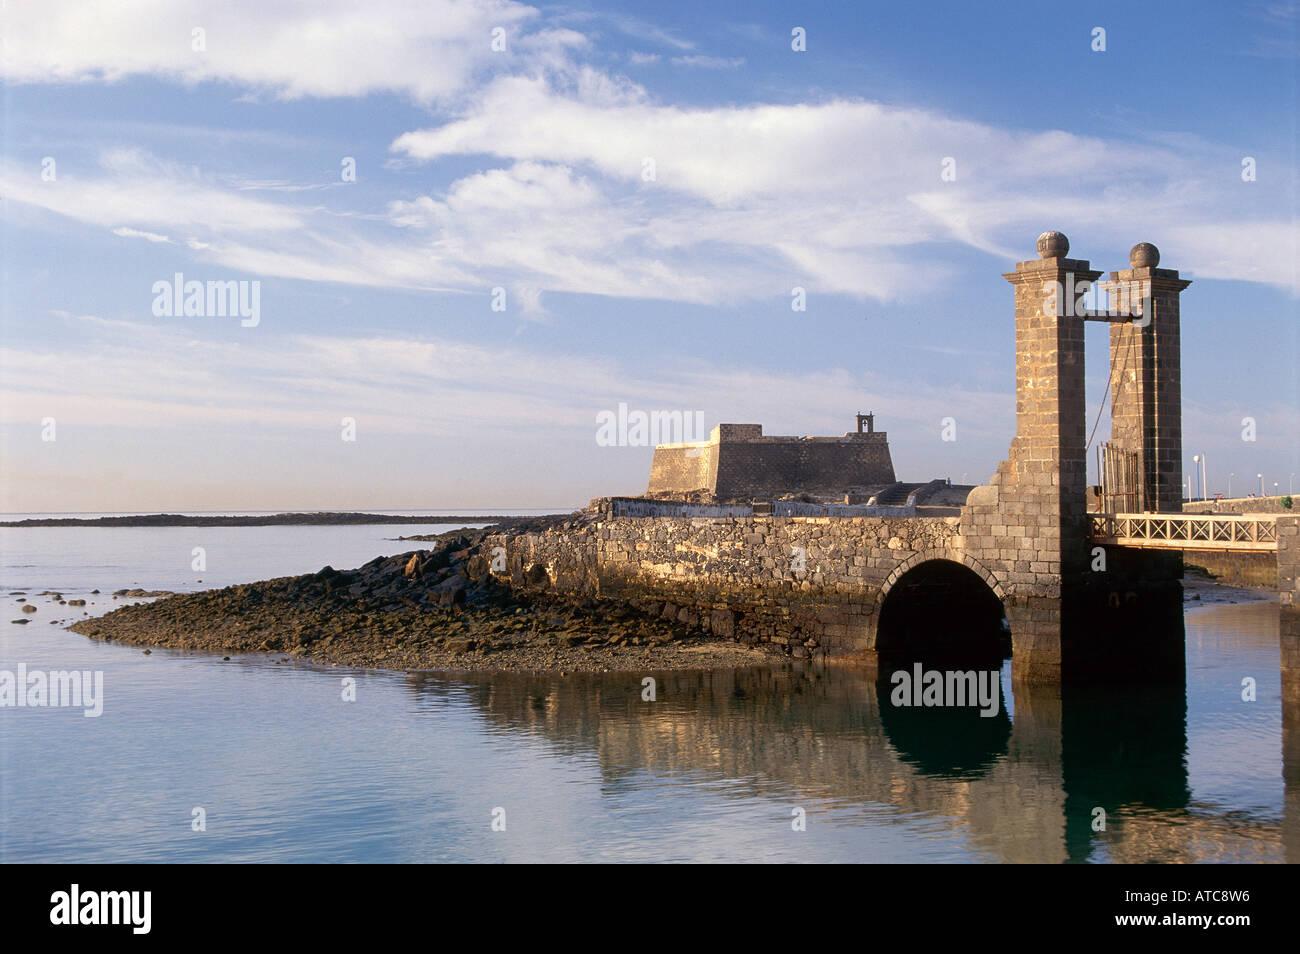 The 16th century Puente de las Bolas with Castillo de San Gabriel in the background beyond the waters off Arrecife Stock Photo